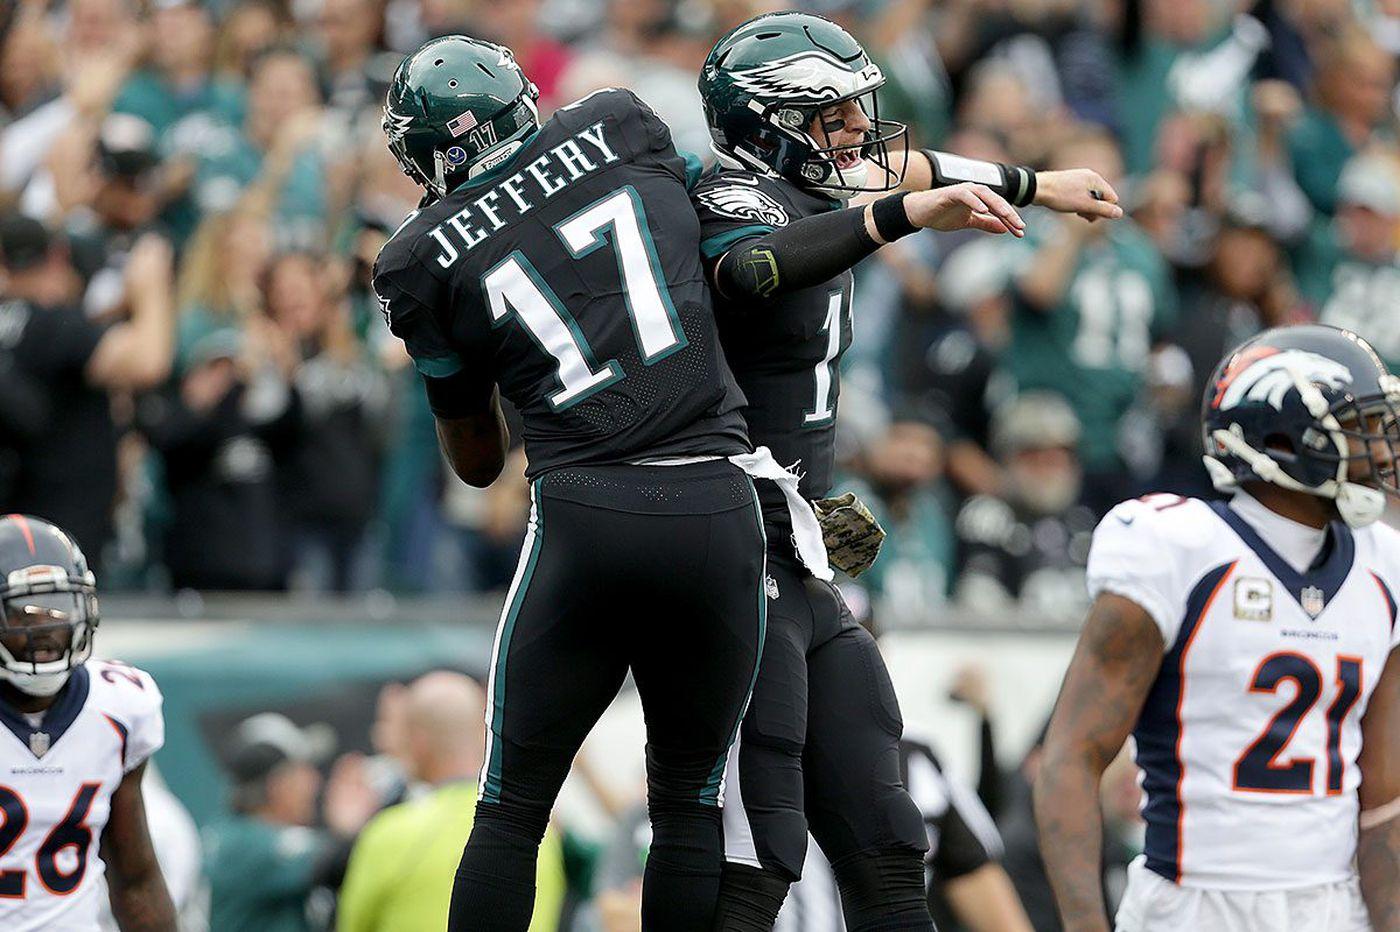 Eagles 51, Broncos 23: Carson Wentz, Corey Clement lead dominant win